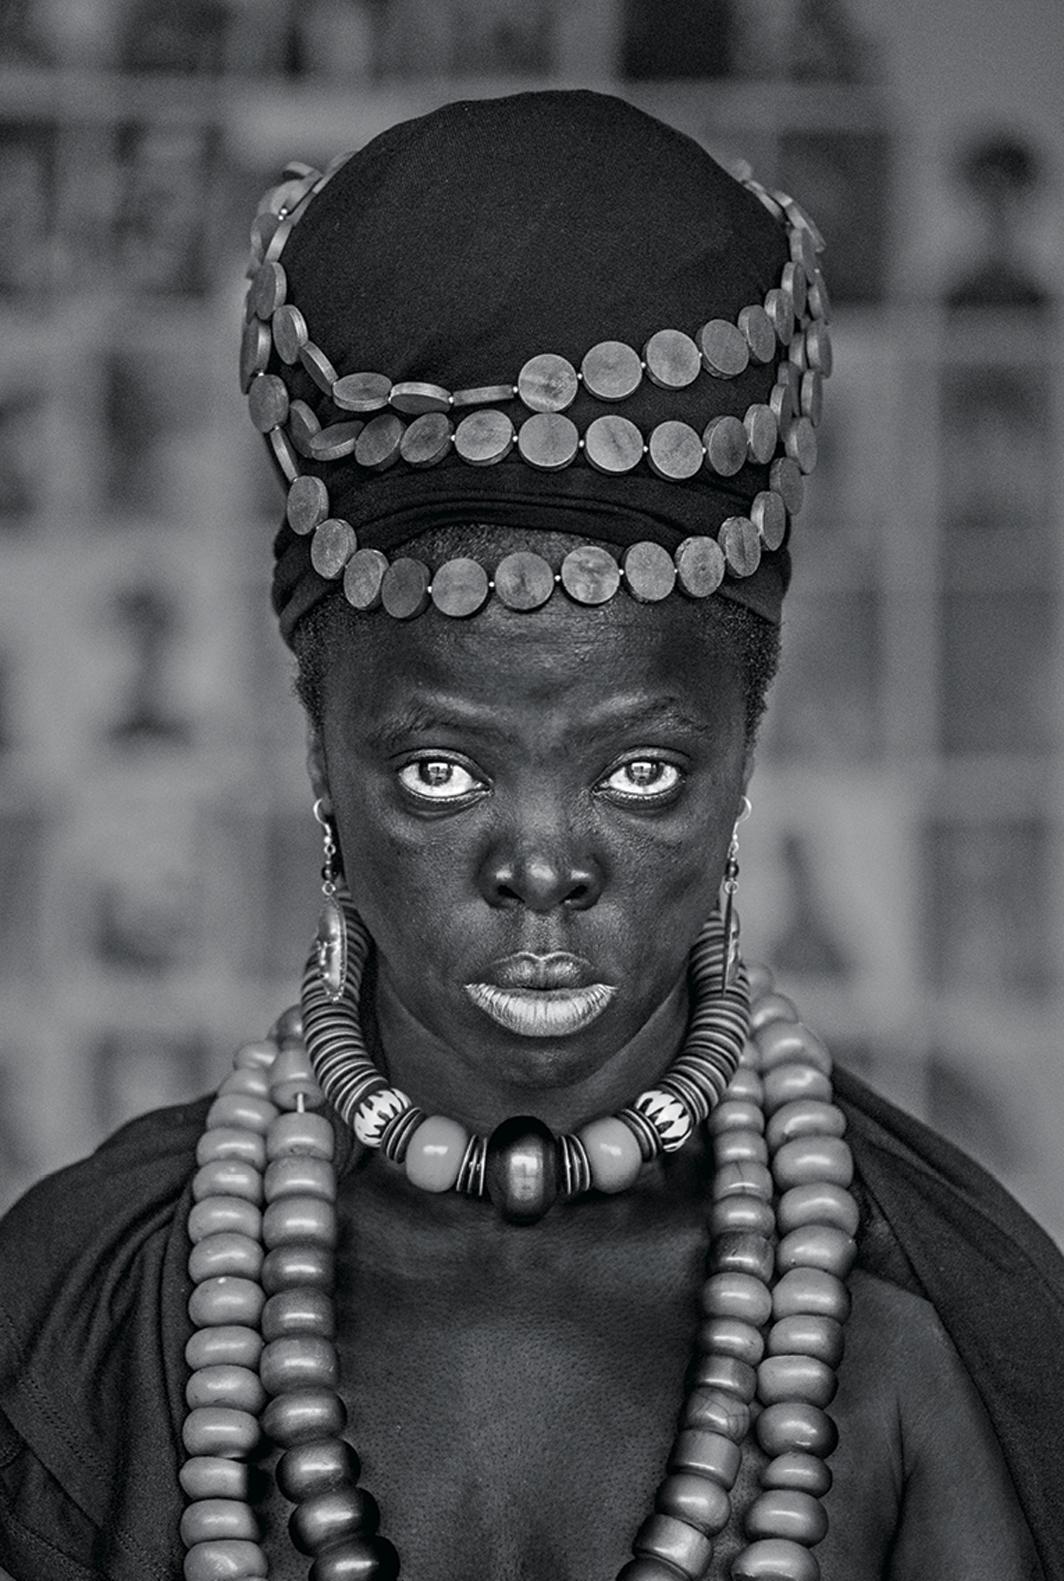 "Zanele Muholi, Bangizwenkosi, The Sails, Durban, 2019, gelatin silver print, 23 5/8 × 15 3/4"". From the series ""Somnyama Ngonyama"" (Hail the Dark Lioness), 2012–."